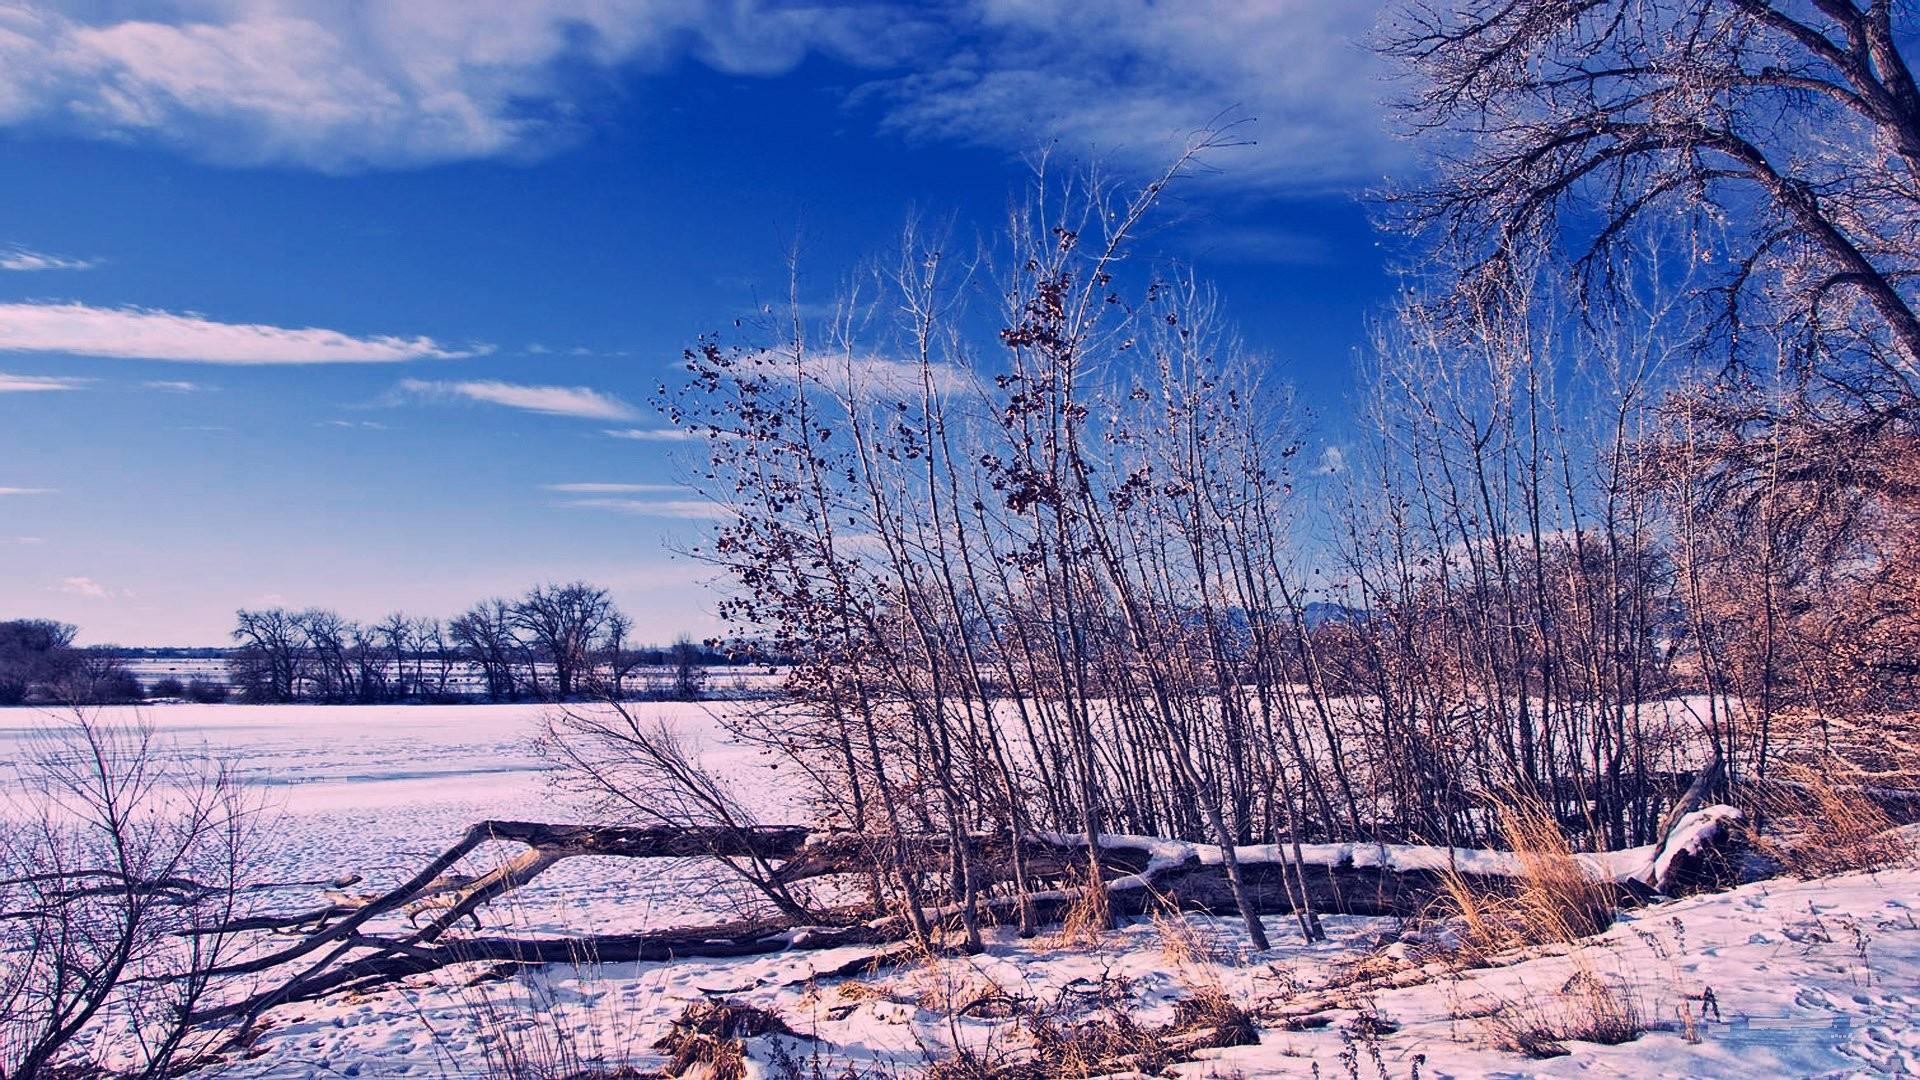 sfondi desktop inverno 42 immagini On sfondi gratis desktop inverno